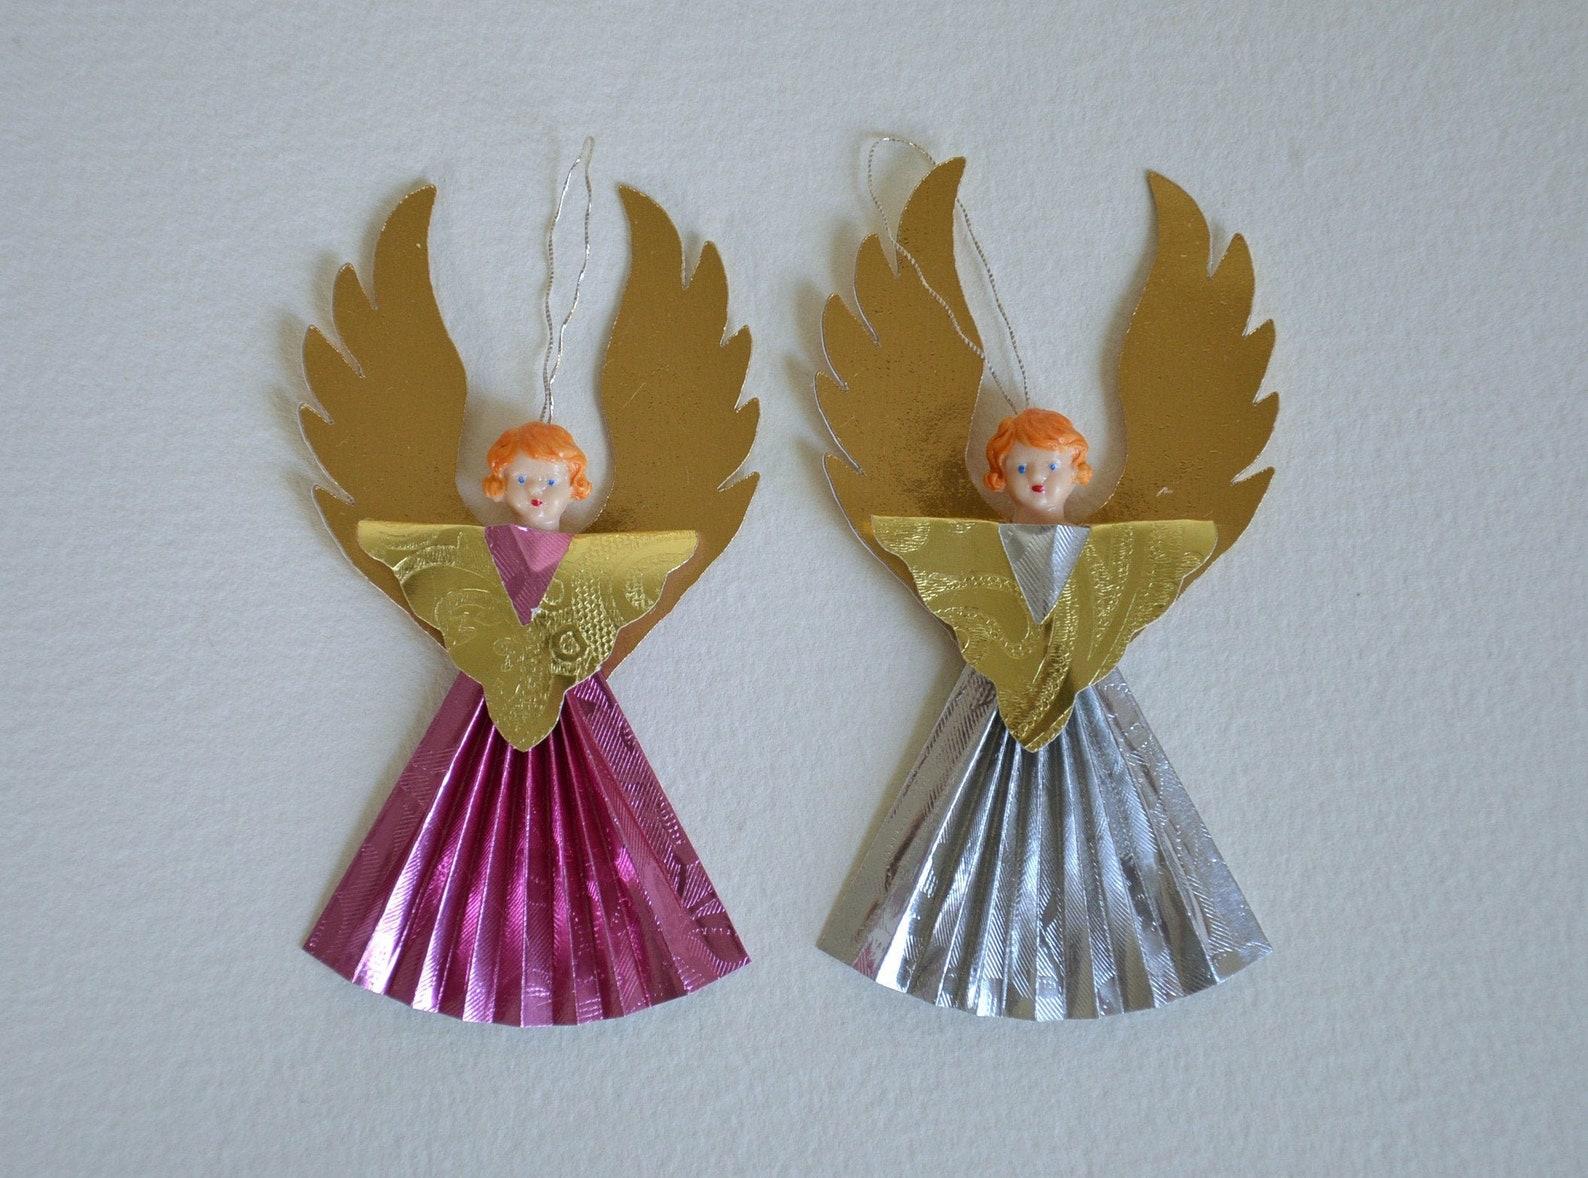 Foil Angel/ Christmas Ornament/ Vintage Style/ Set Of 2